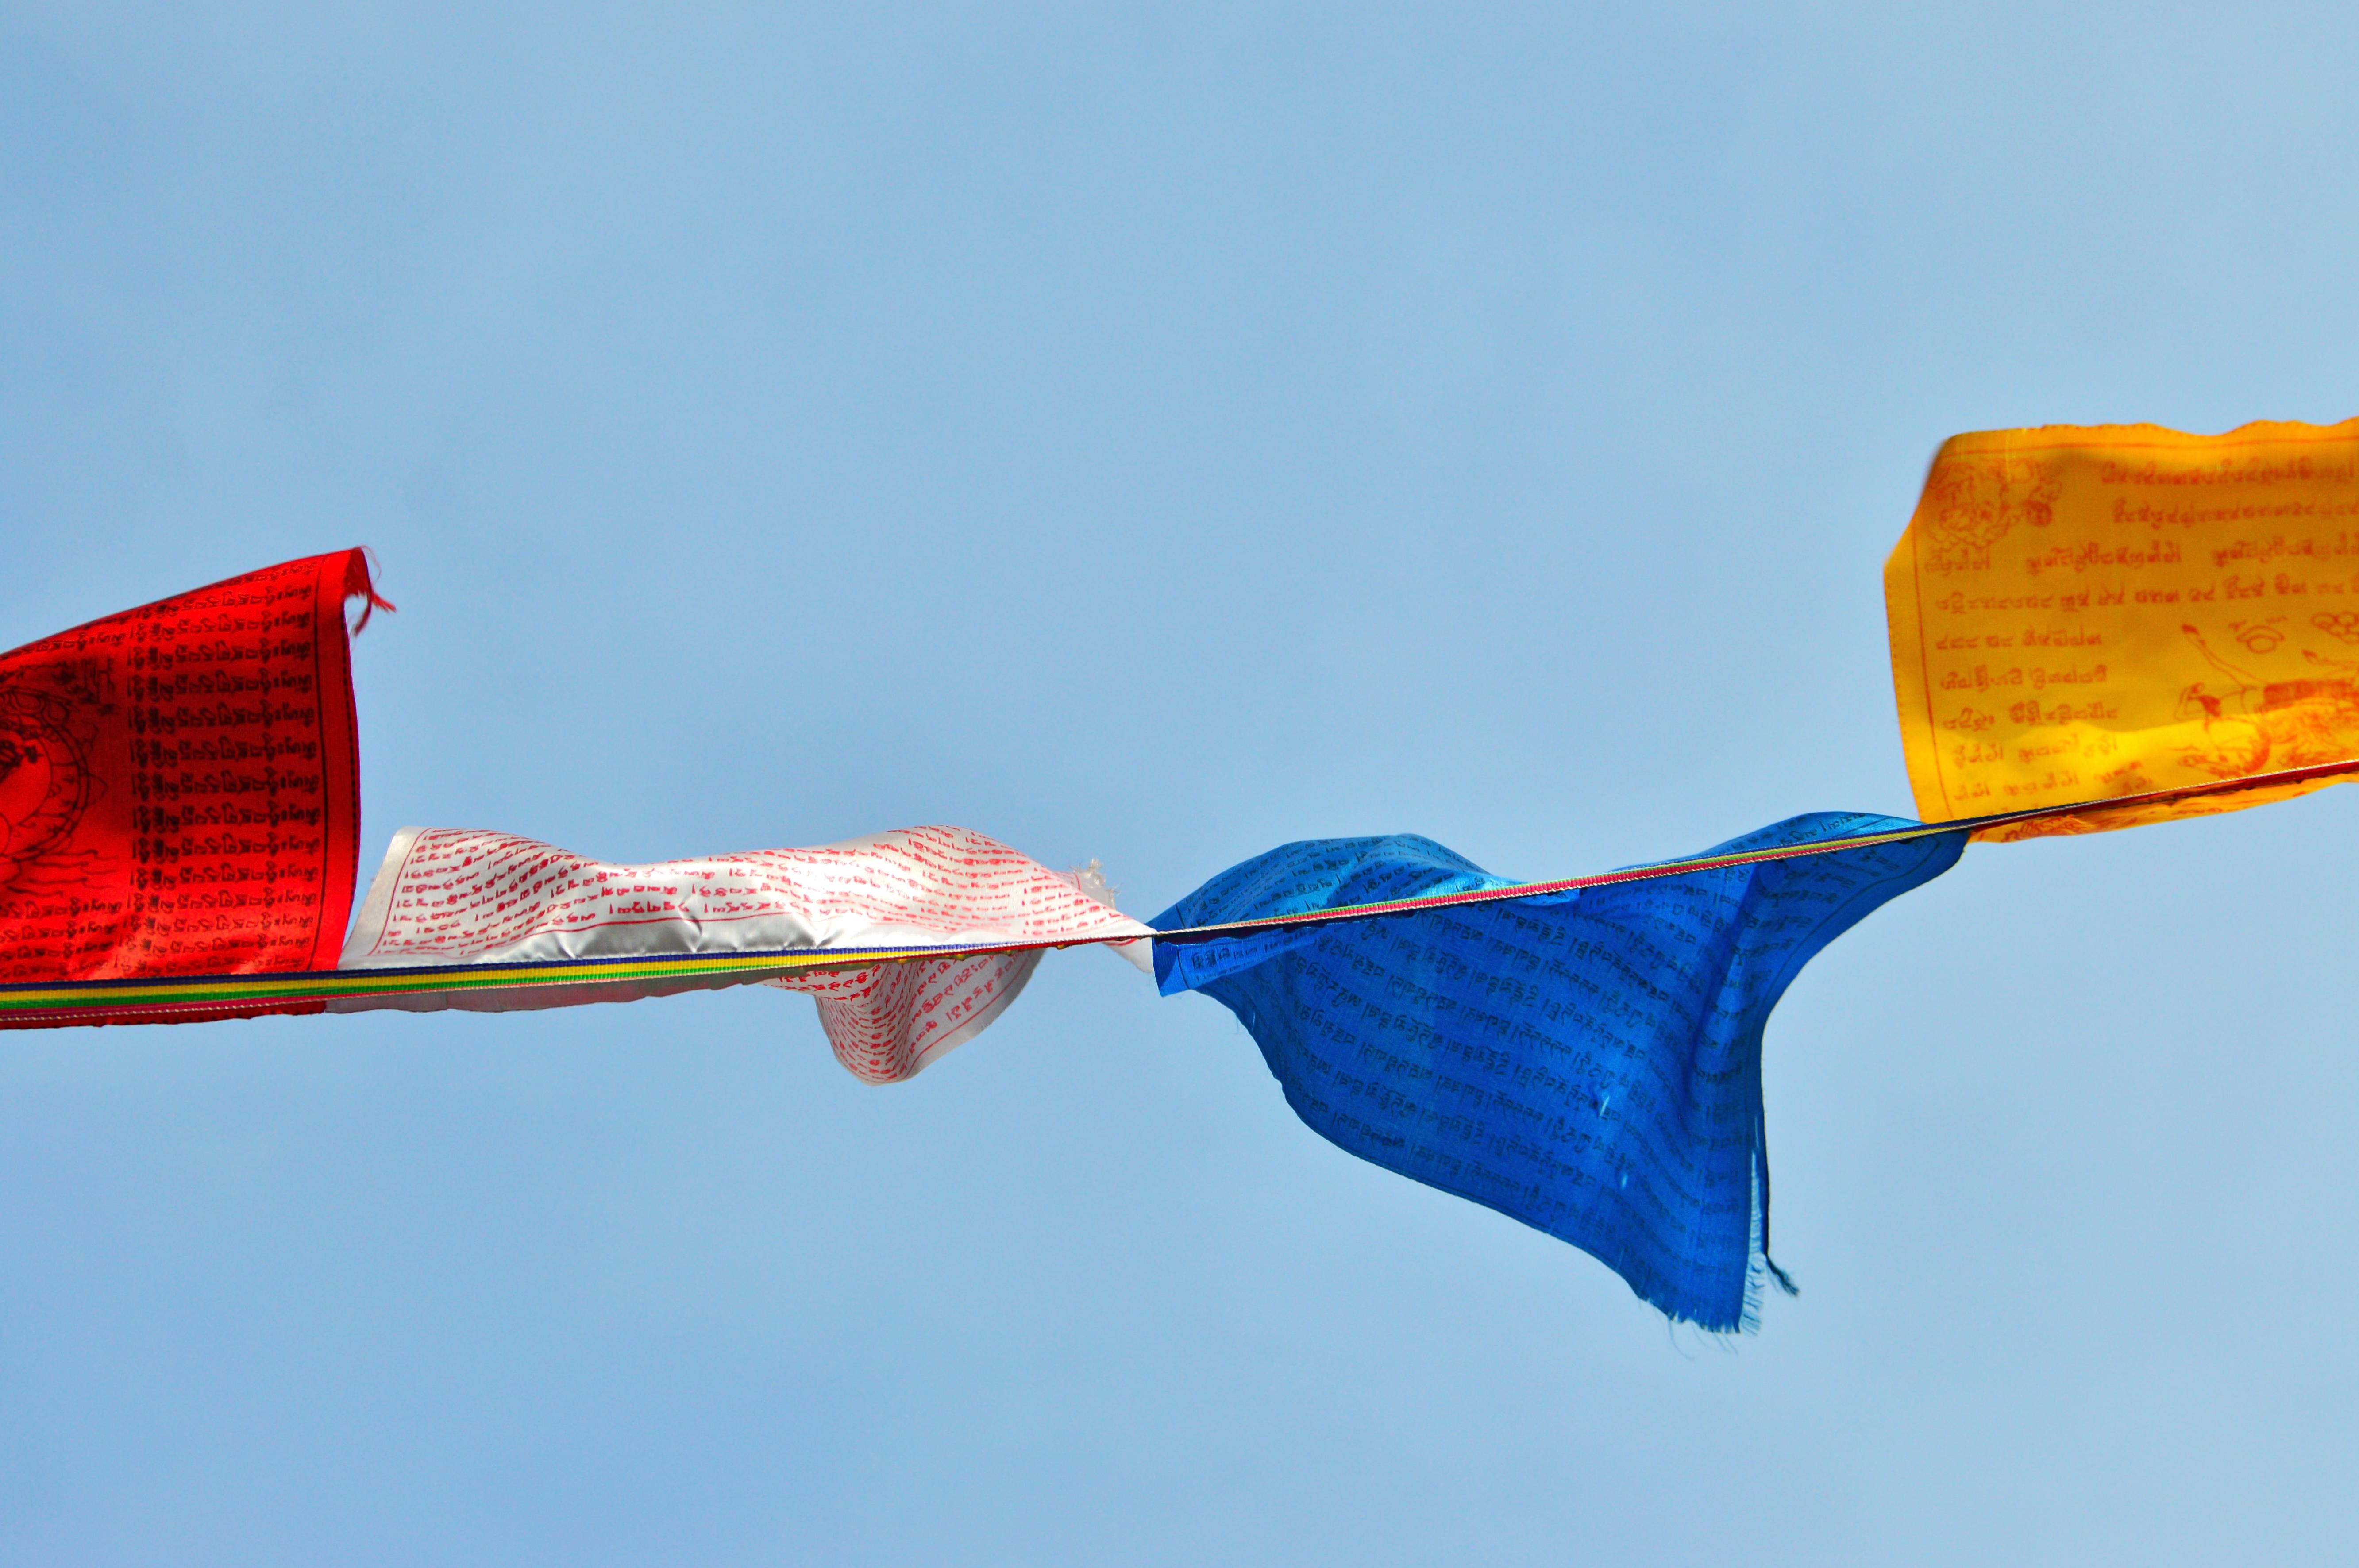 2a49a5b5 Gratis billeder : rød, himmel, blå, gul, dagtimerne, windsports, air ...